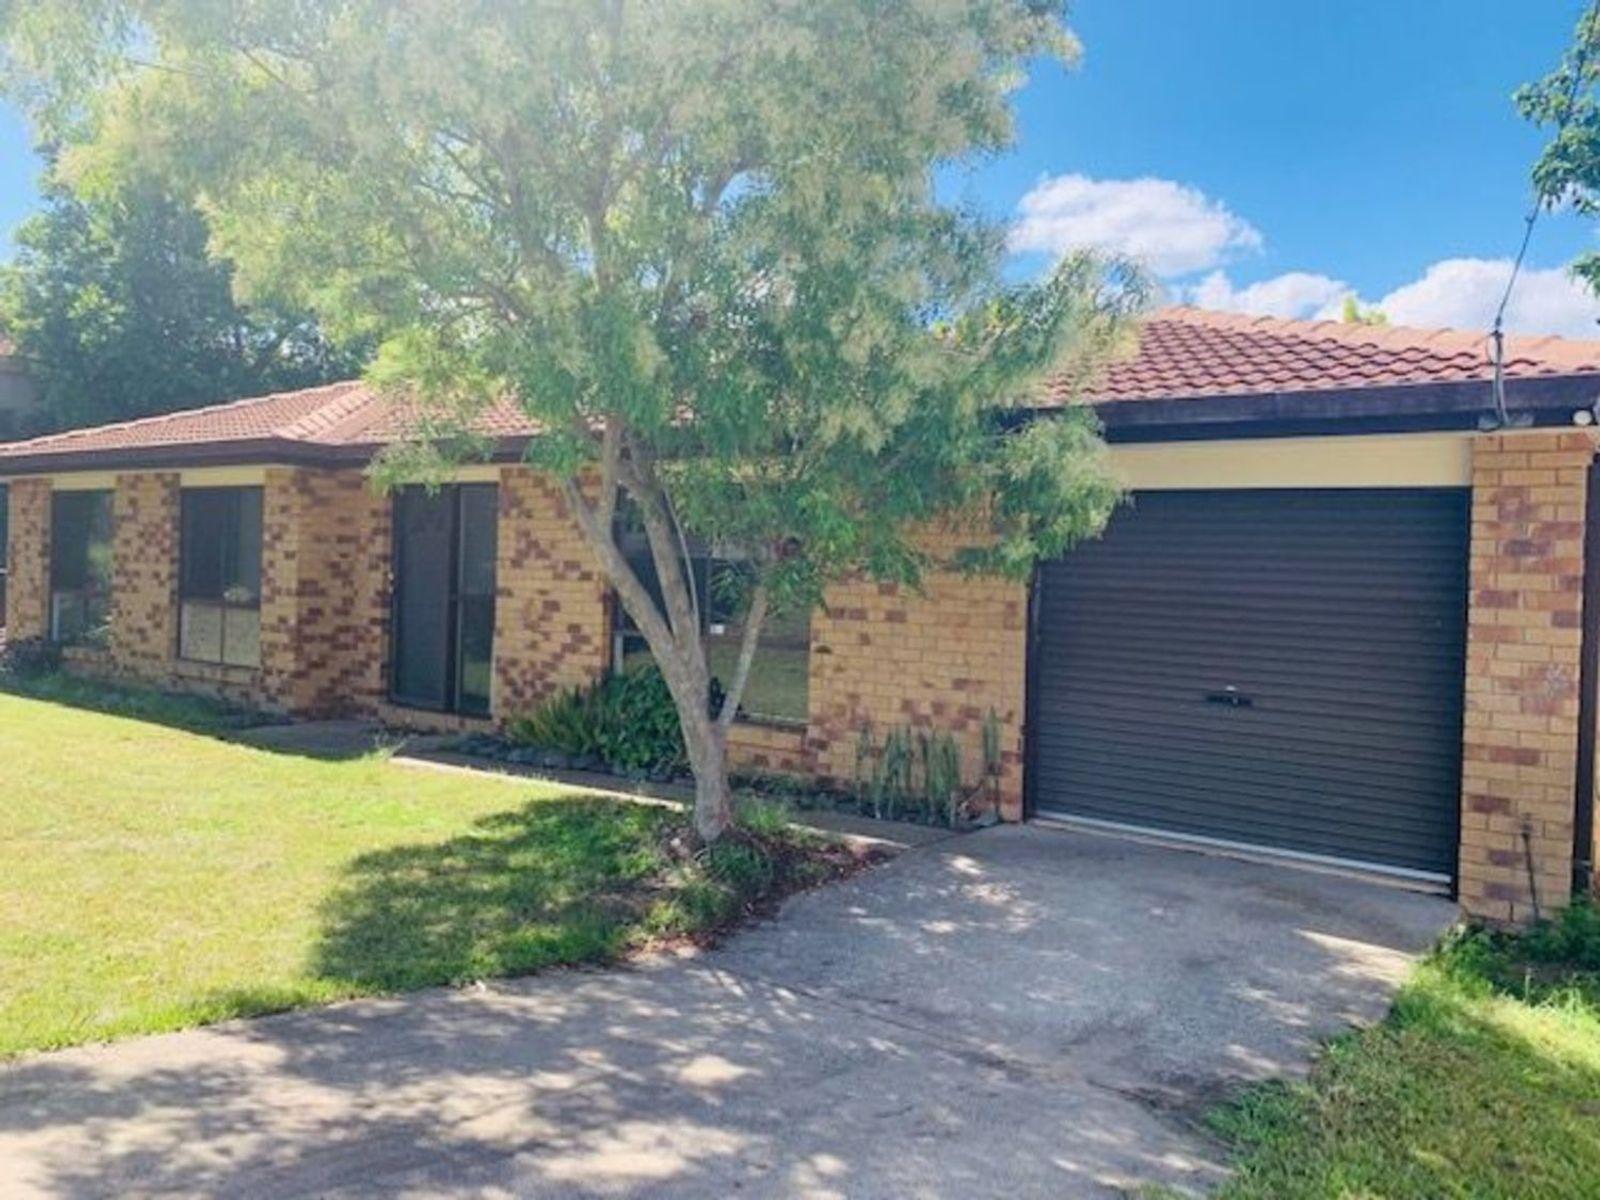 45 Silvertop Street, Hillcrest, QLD 4118